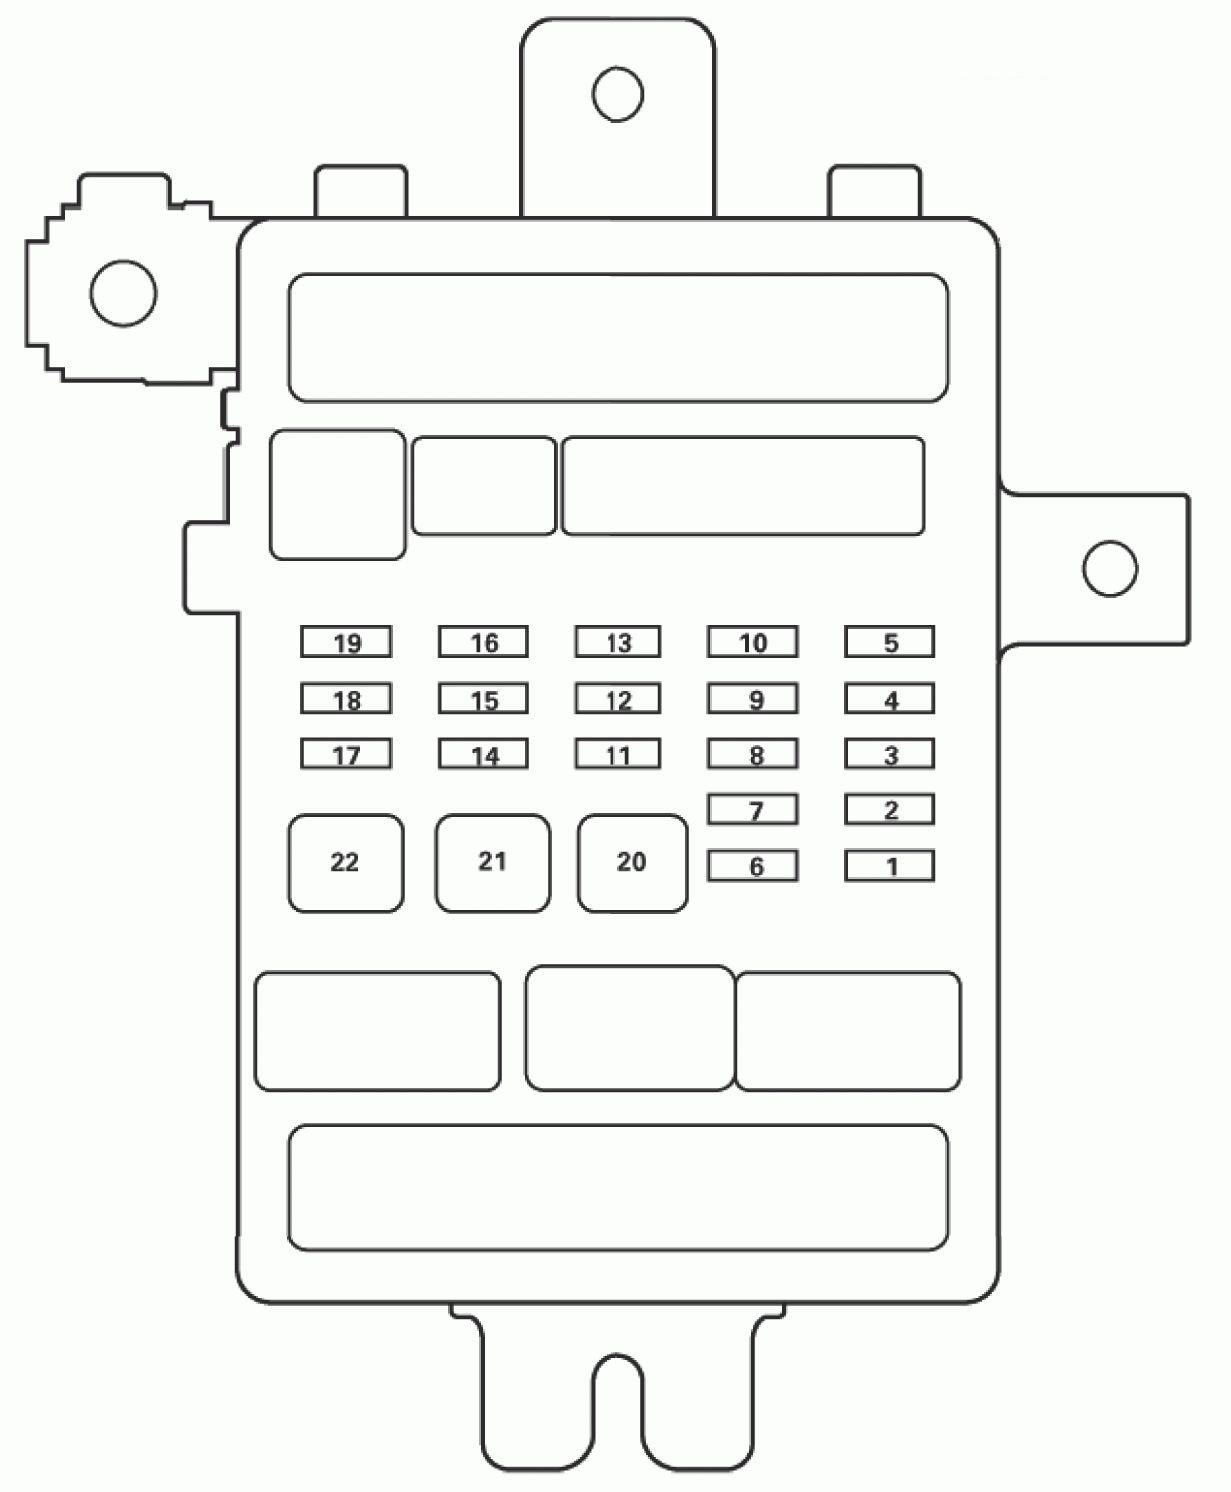 hight resolution of acura tl fuse box diagram passenger s under dash fuse relay box